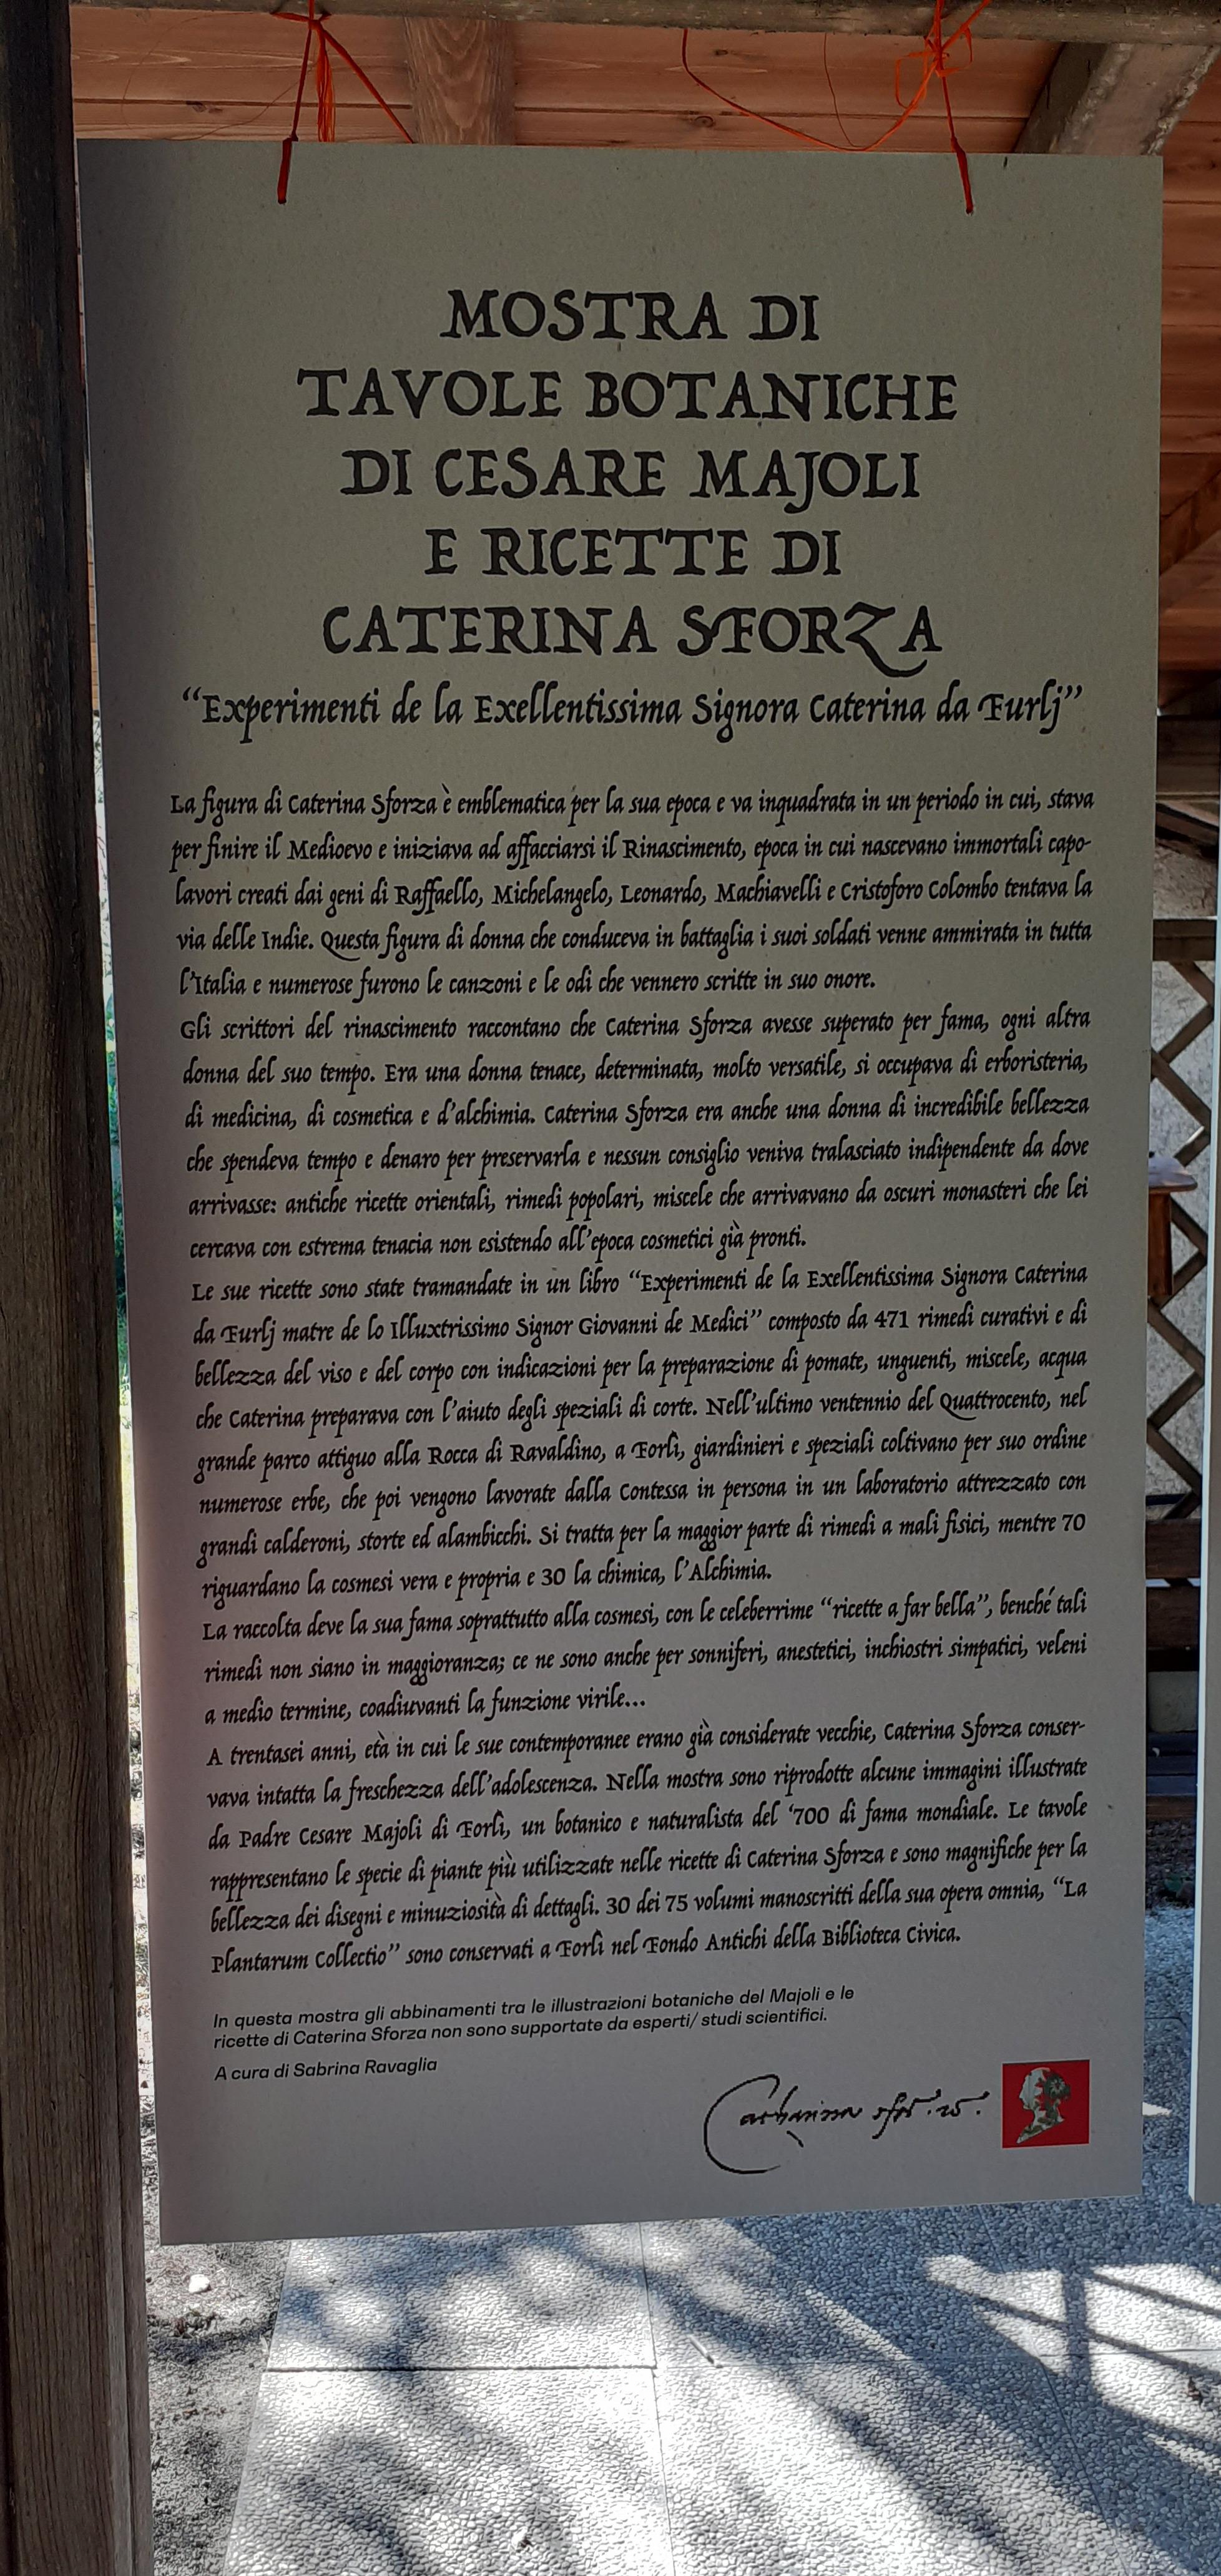 Cocla-13-giu-21-2-Tavole-botaniche-Maioli